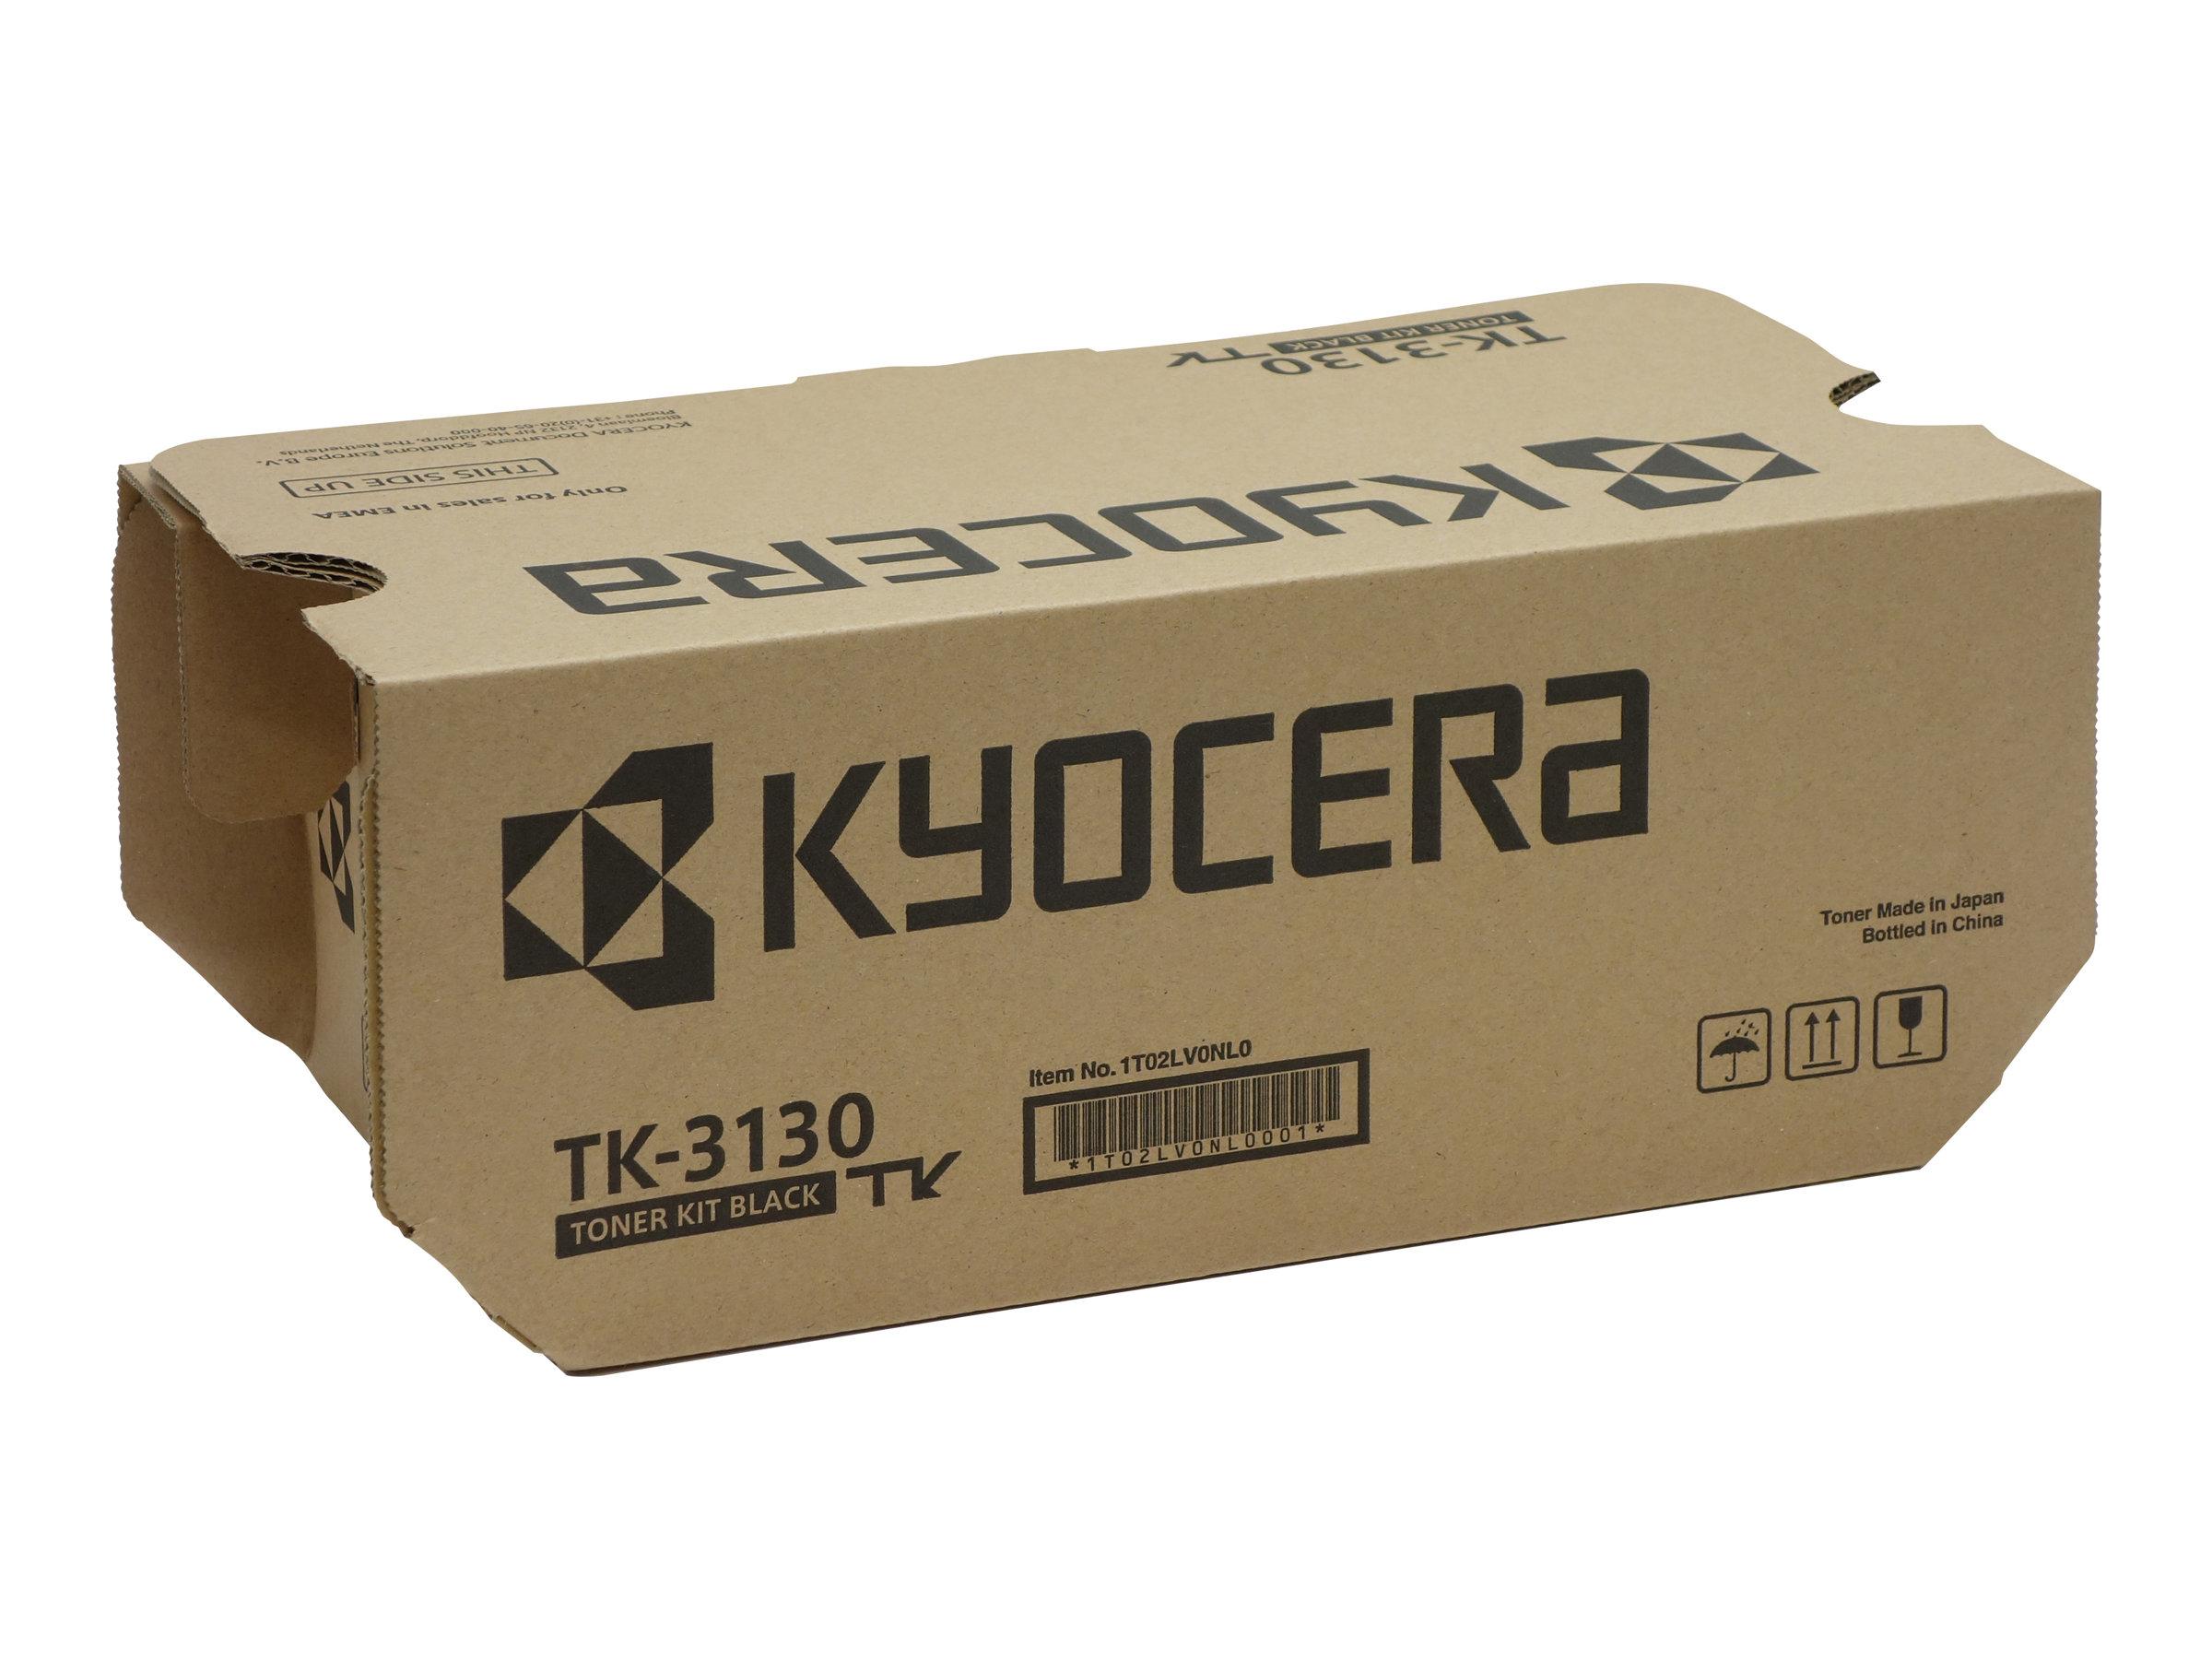 Kyocera TK 3130 - Schwarz - Original - Tonerpatrone